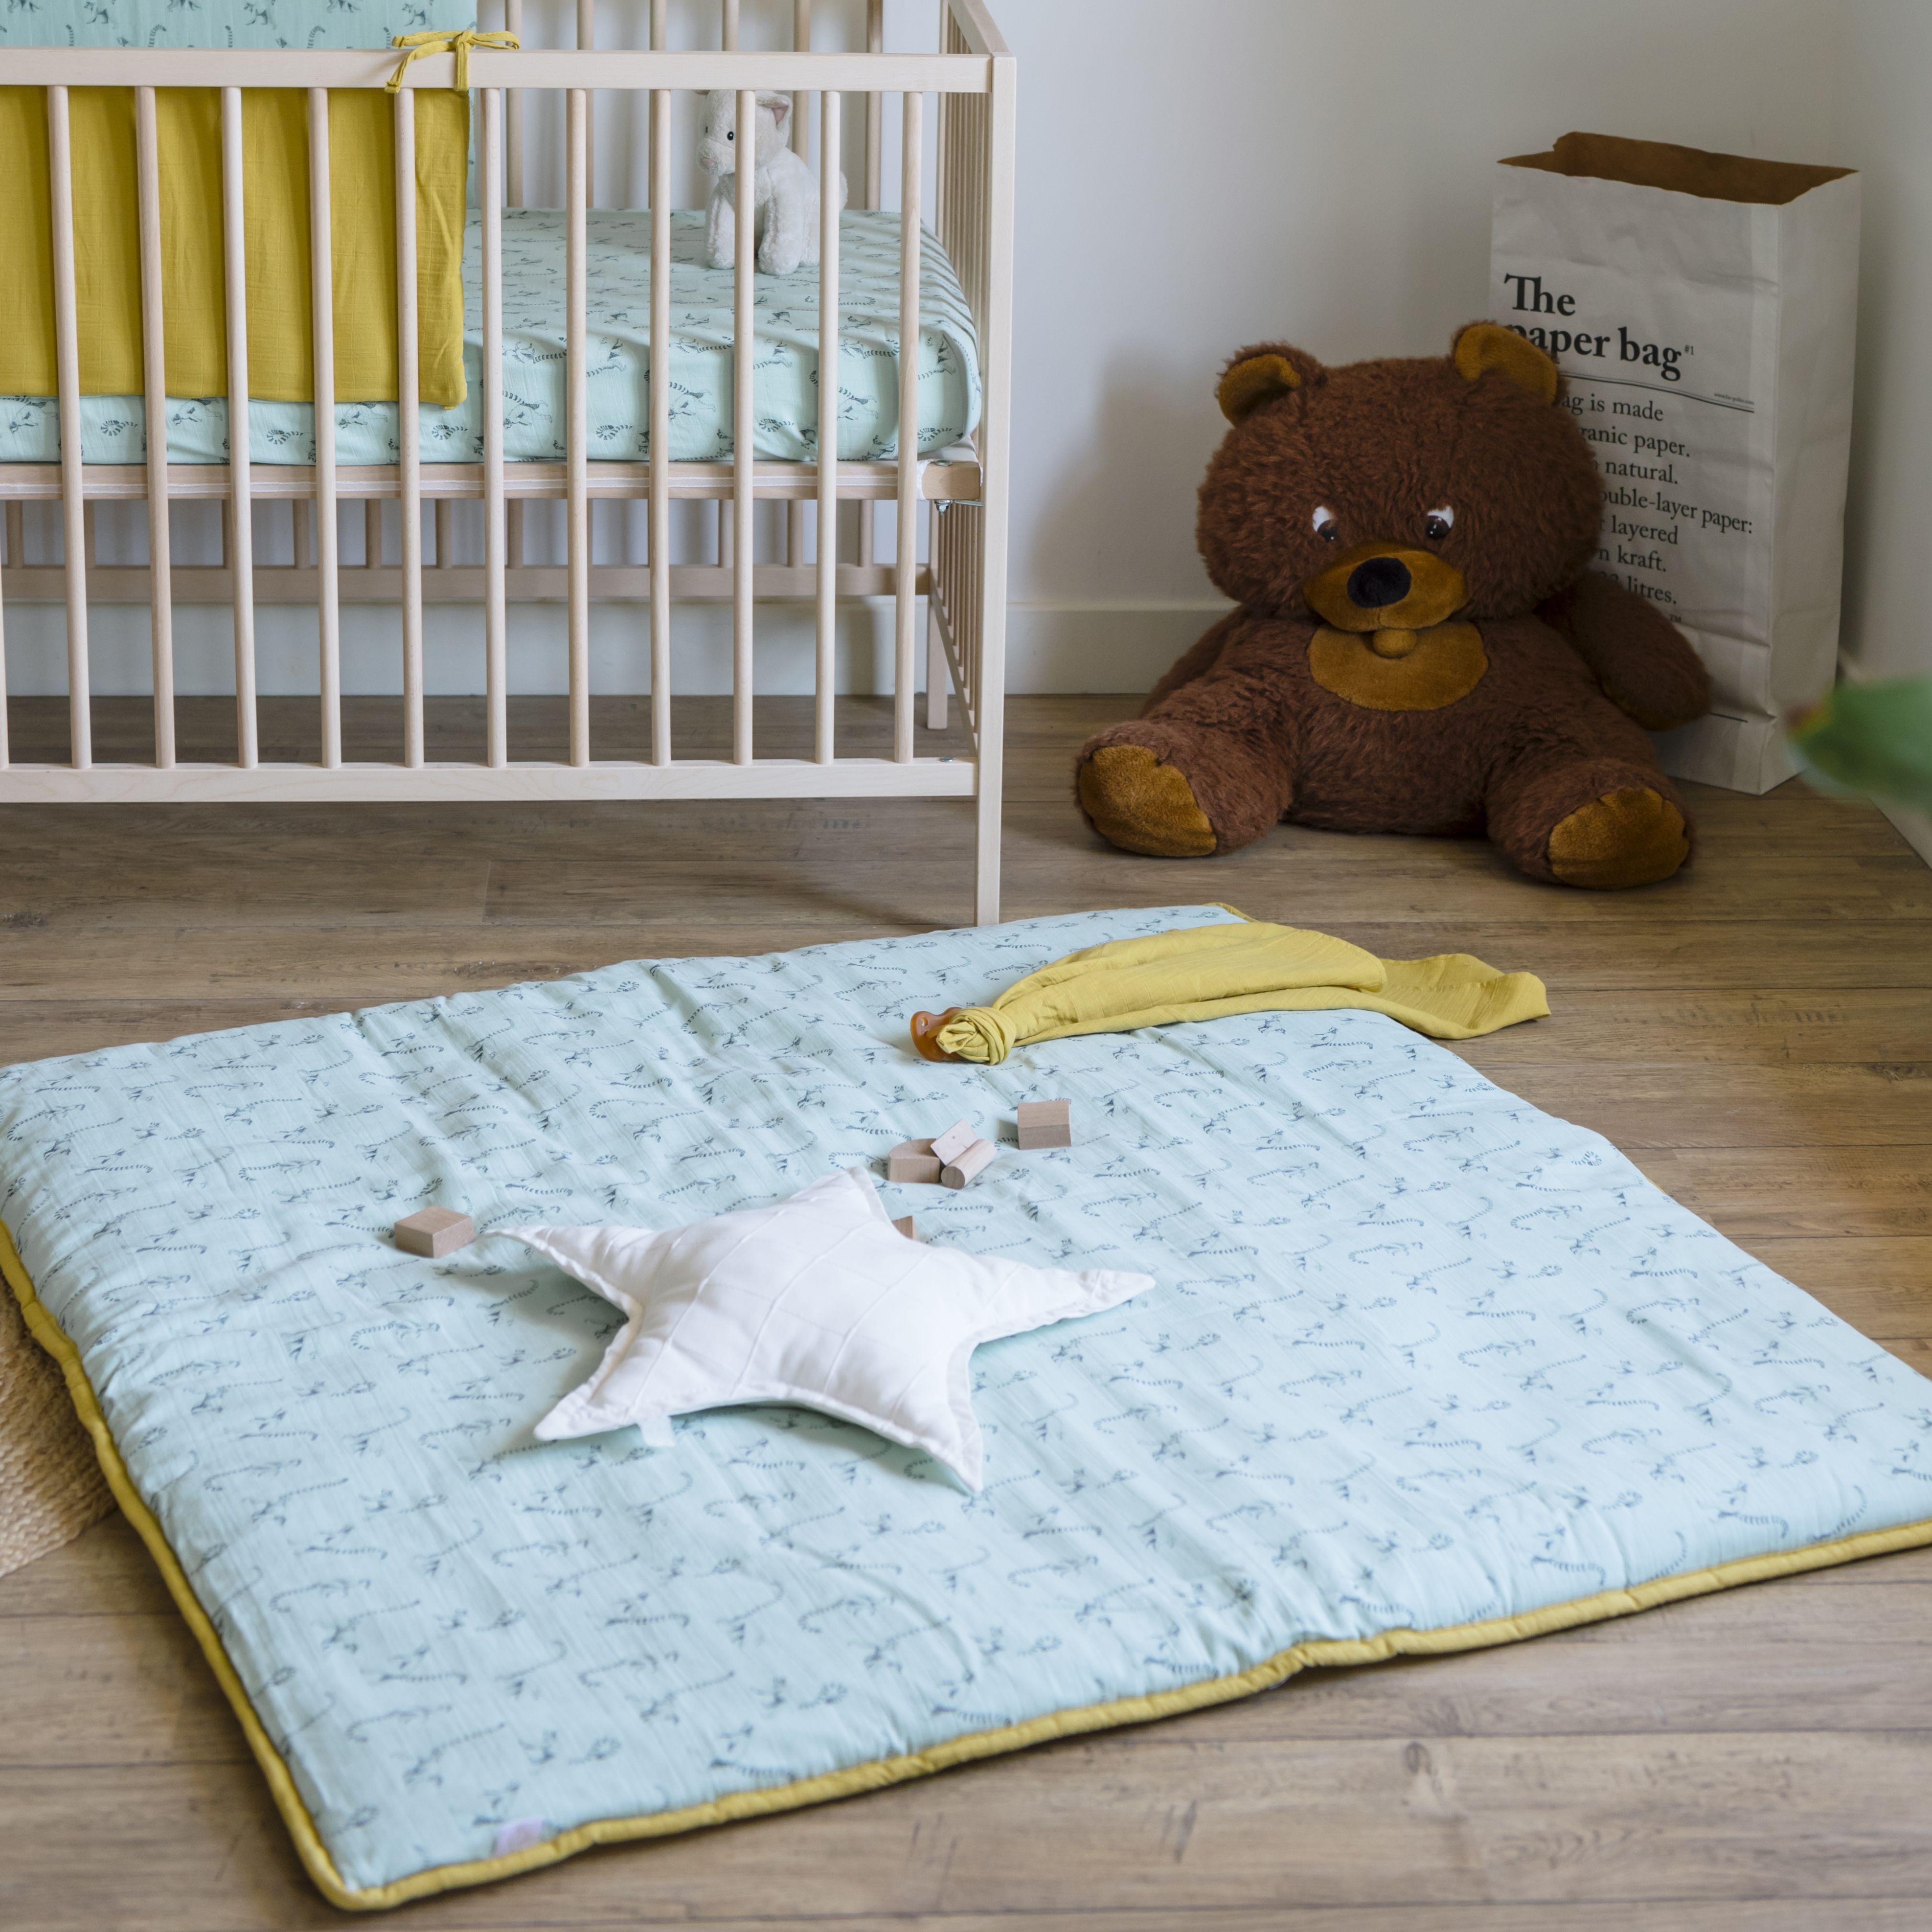 grand tapis d eveil bebe lemurien certifie oeko tex milinane tapis jeux bebe literie de pepiniere tapis eveil